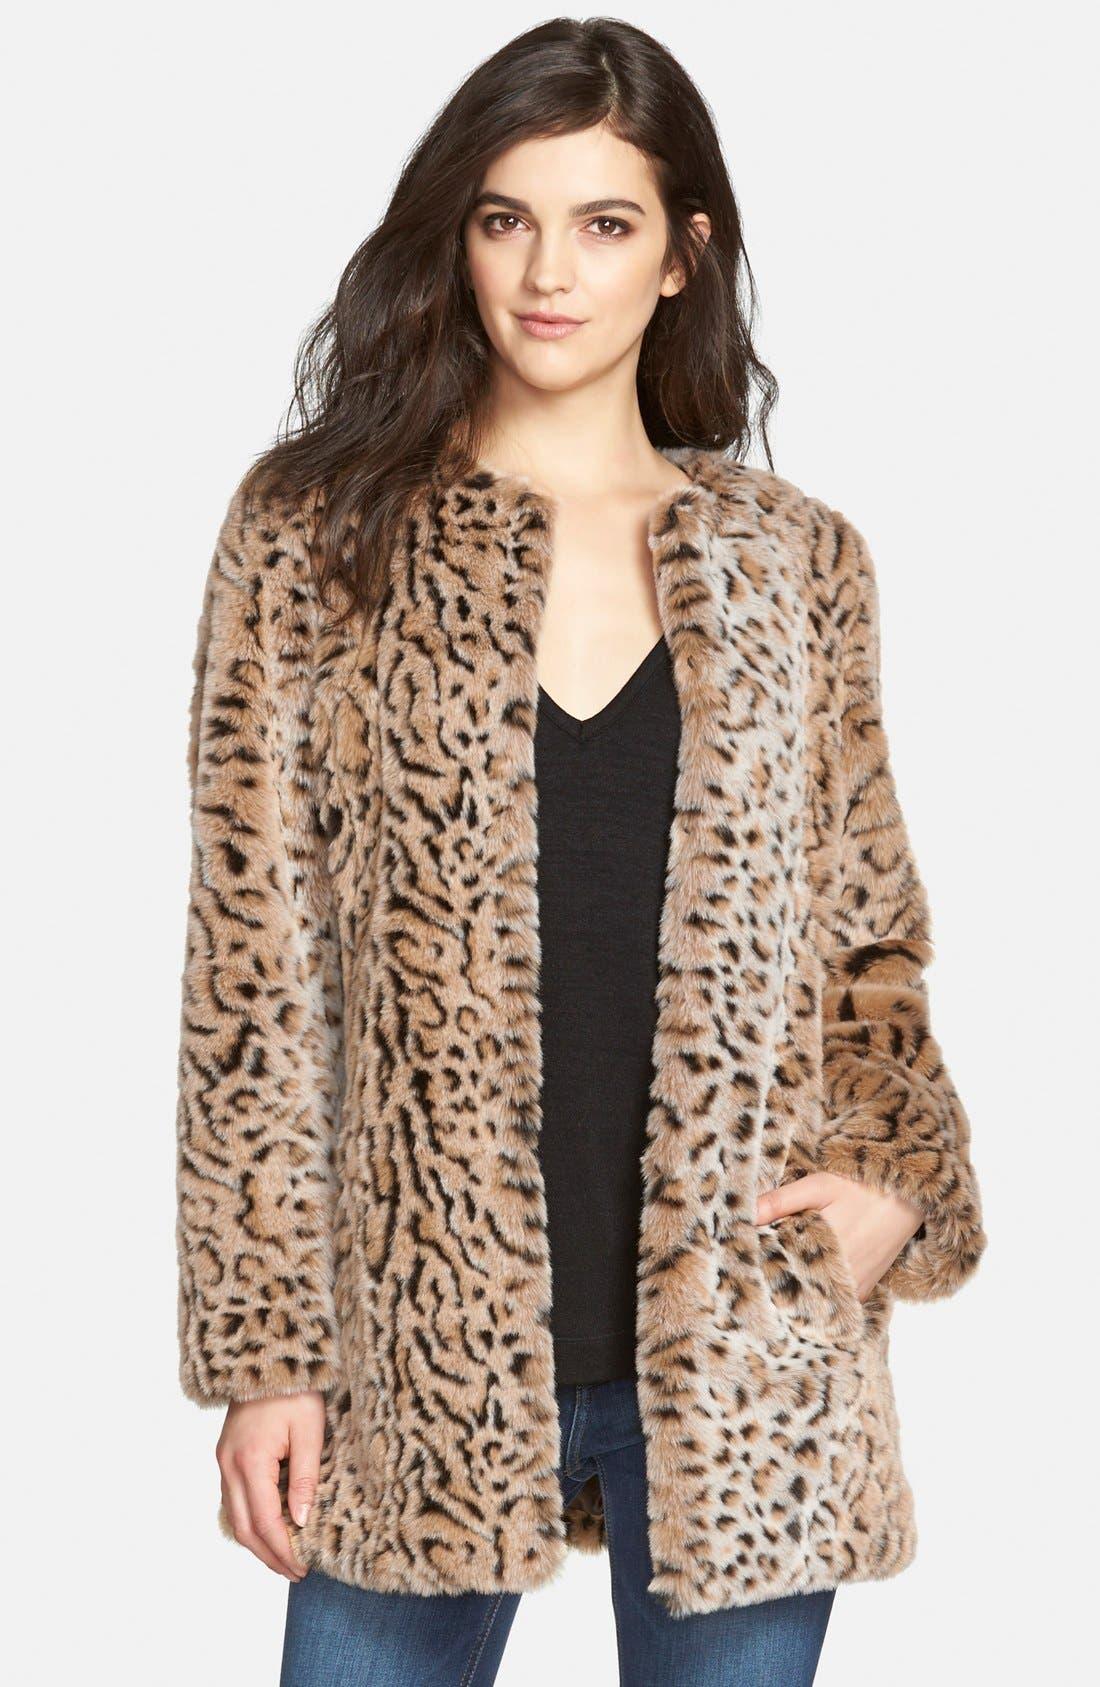 Alternate Image 1 Selected - Steve Madden Faux Fur Leopard Print Coat